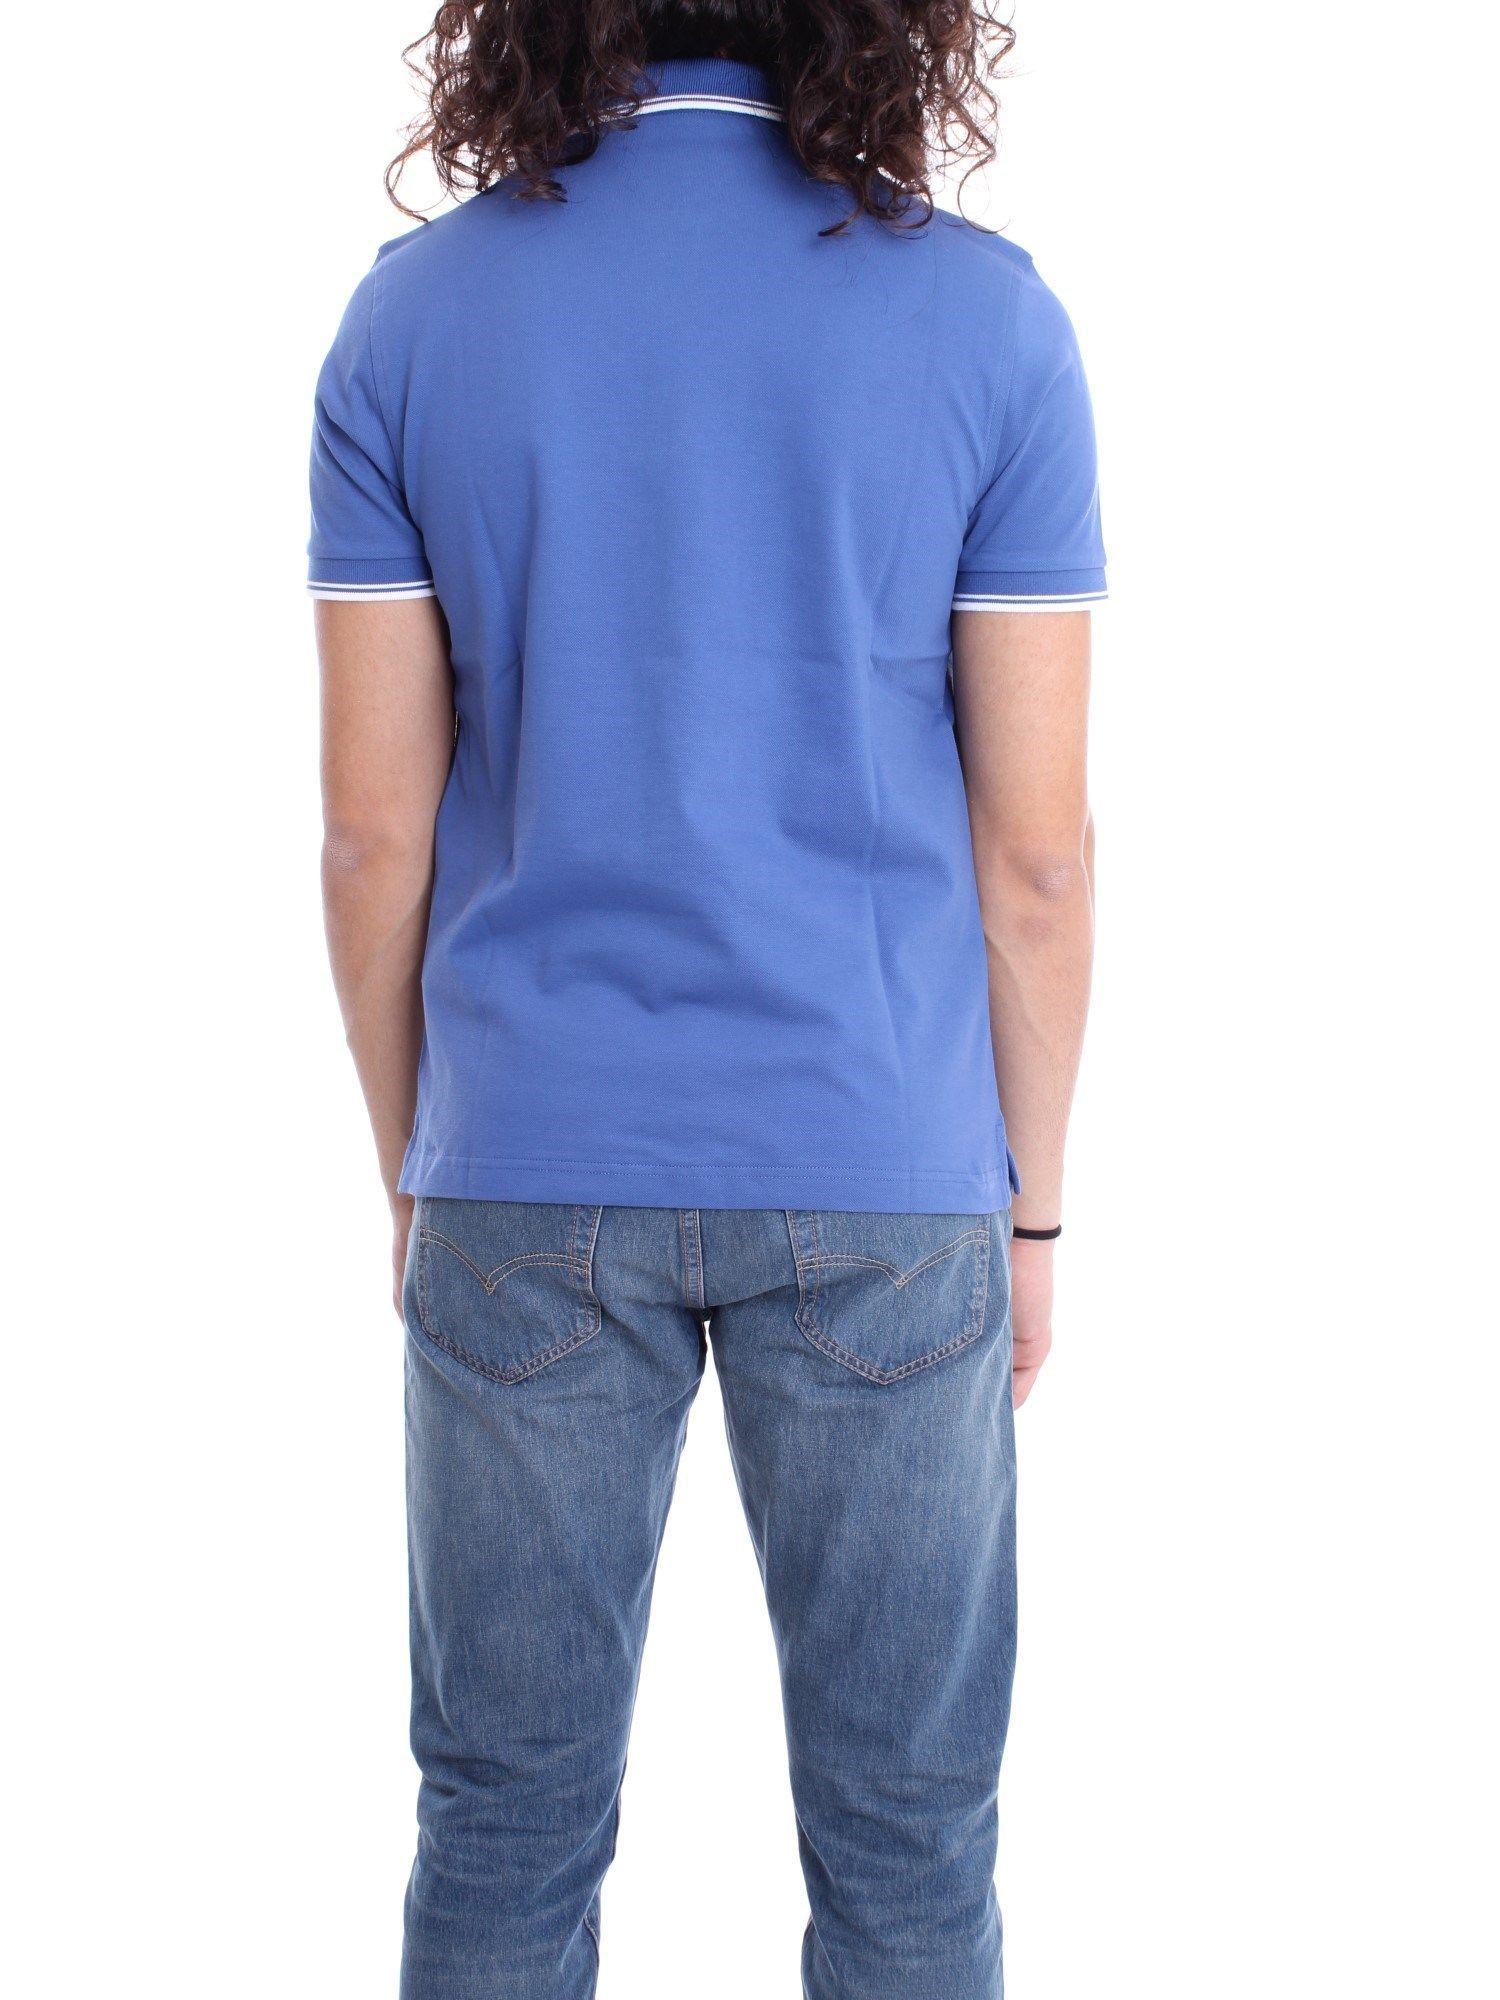 FAY MEN'S NPMB240140SITOU214 BLUE COTTON POLO SHIRT